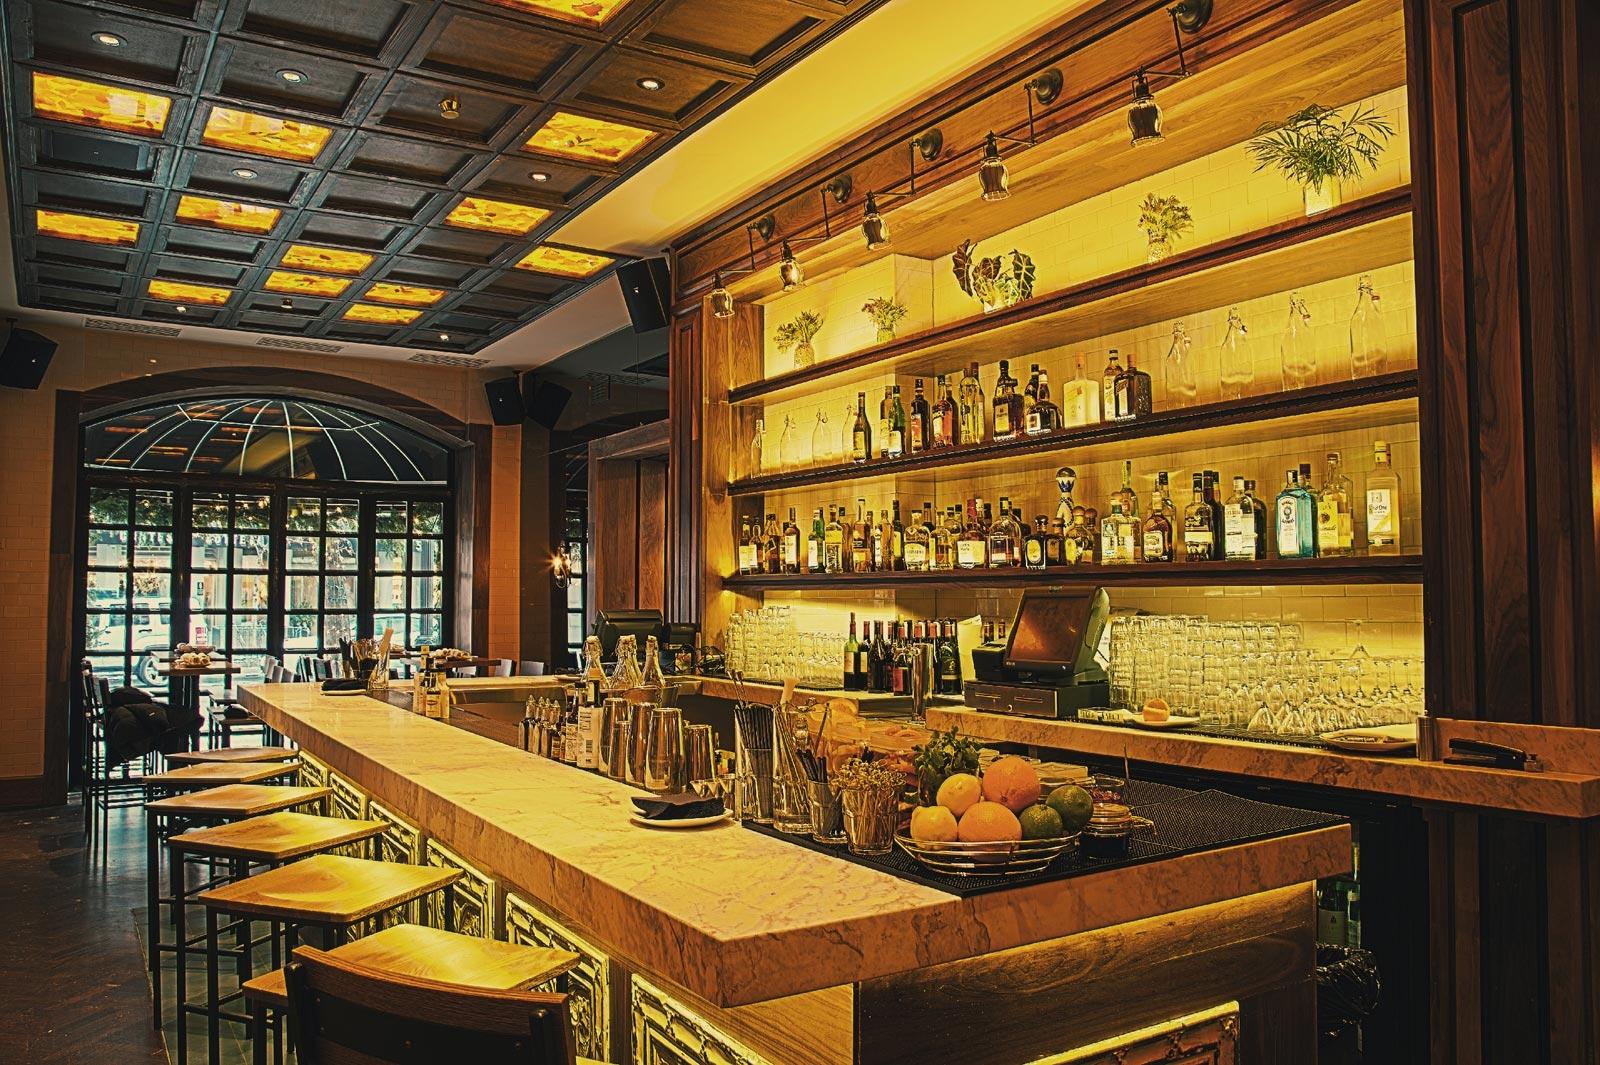 The talbott hotel in chicago il 60611 for Talbott hotel chicago